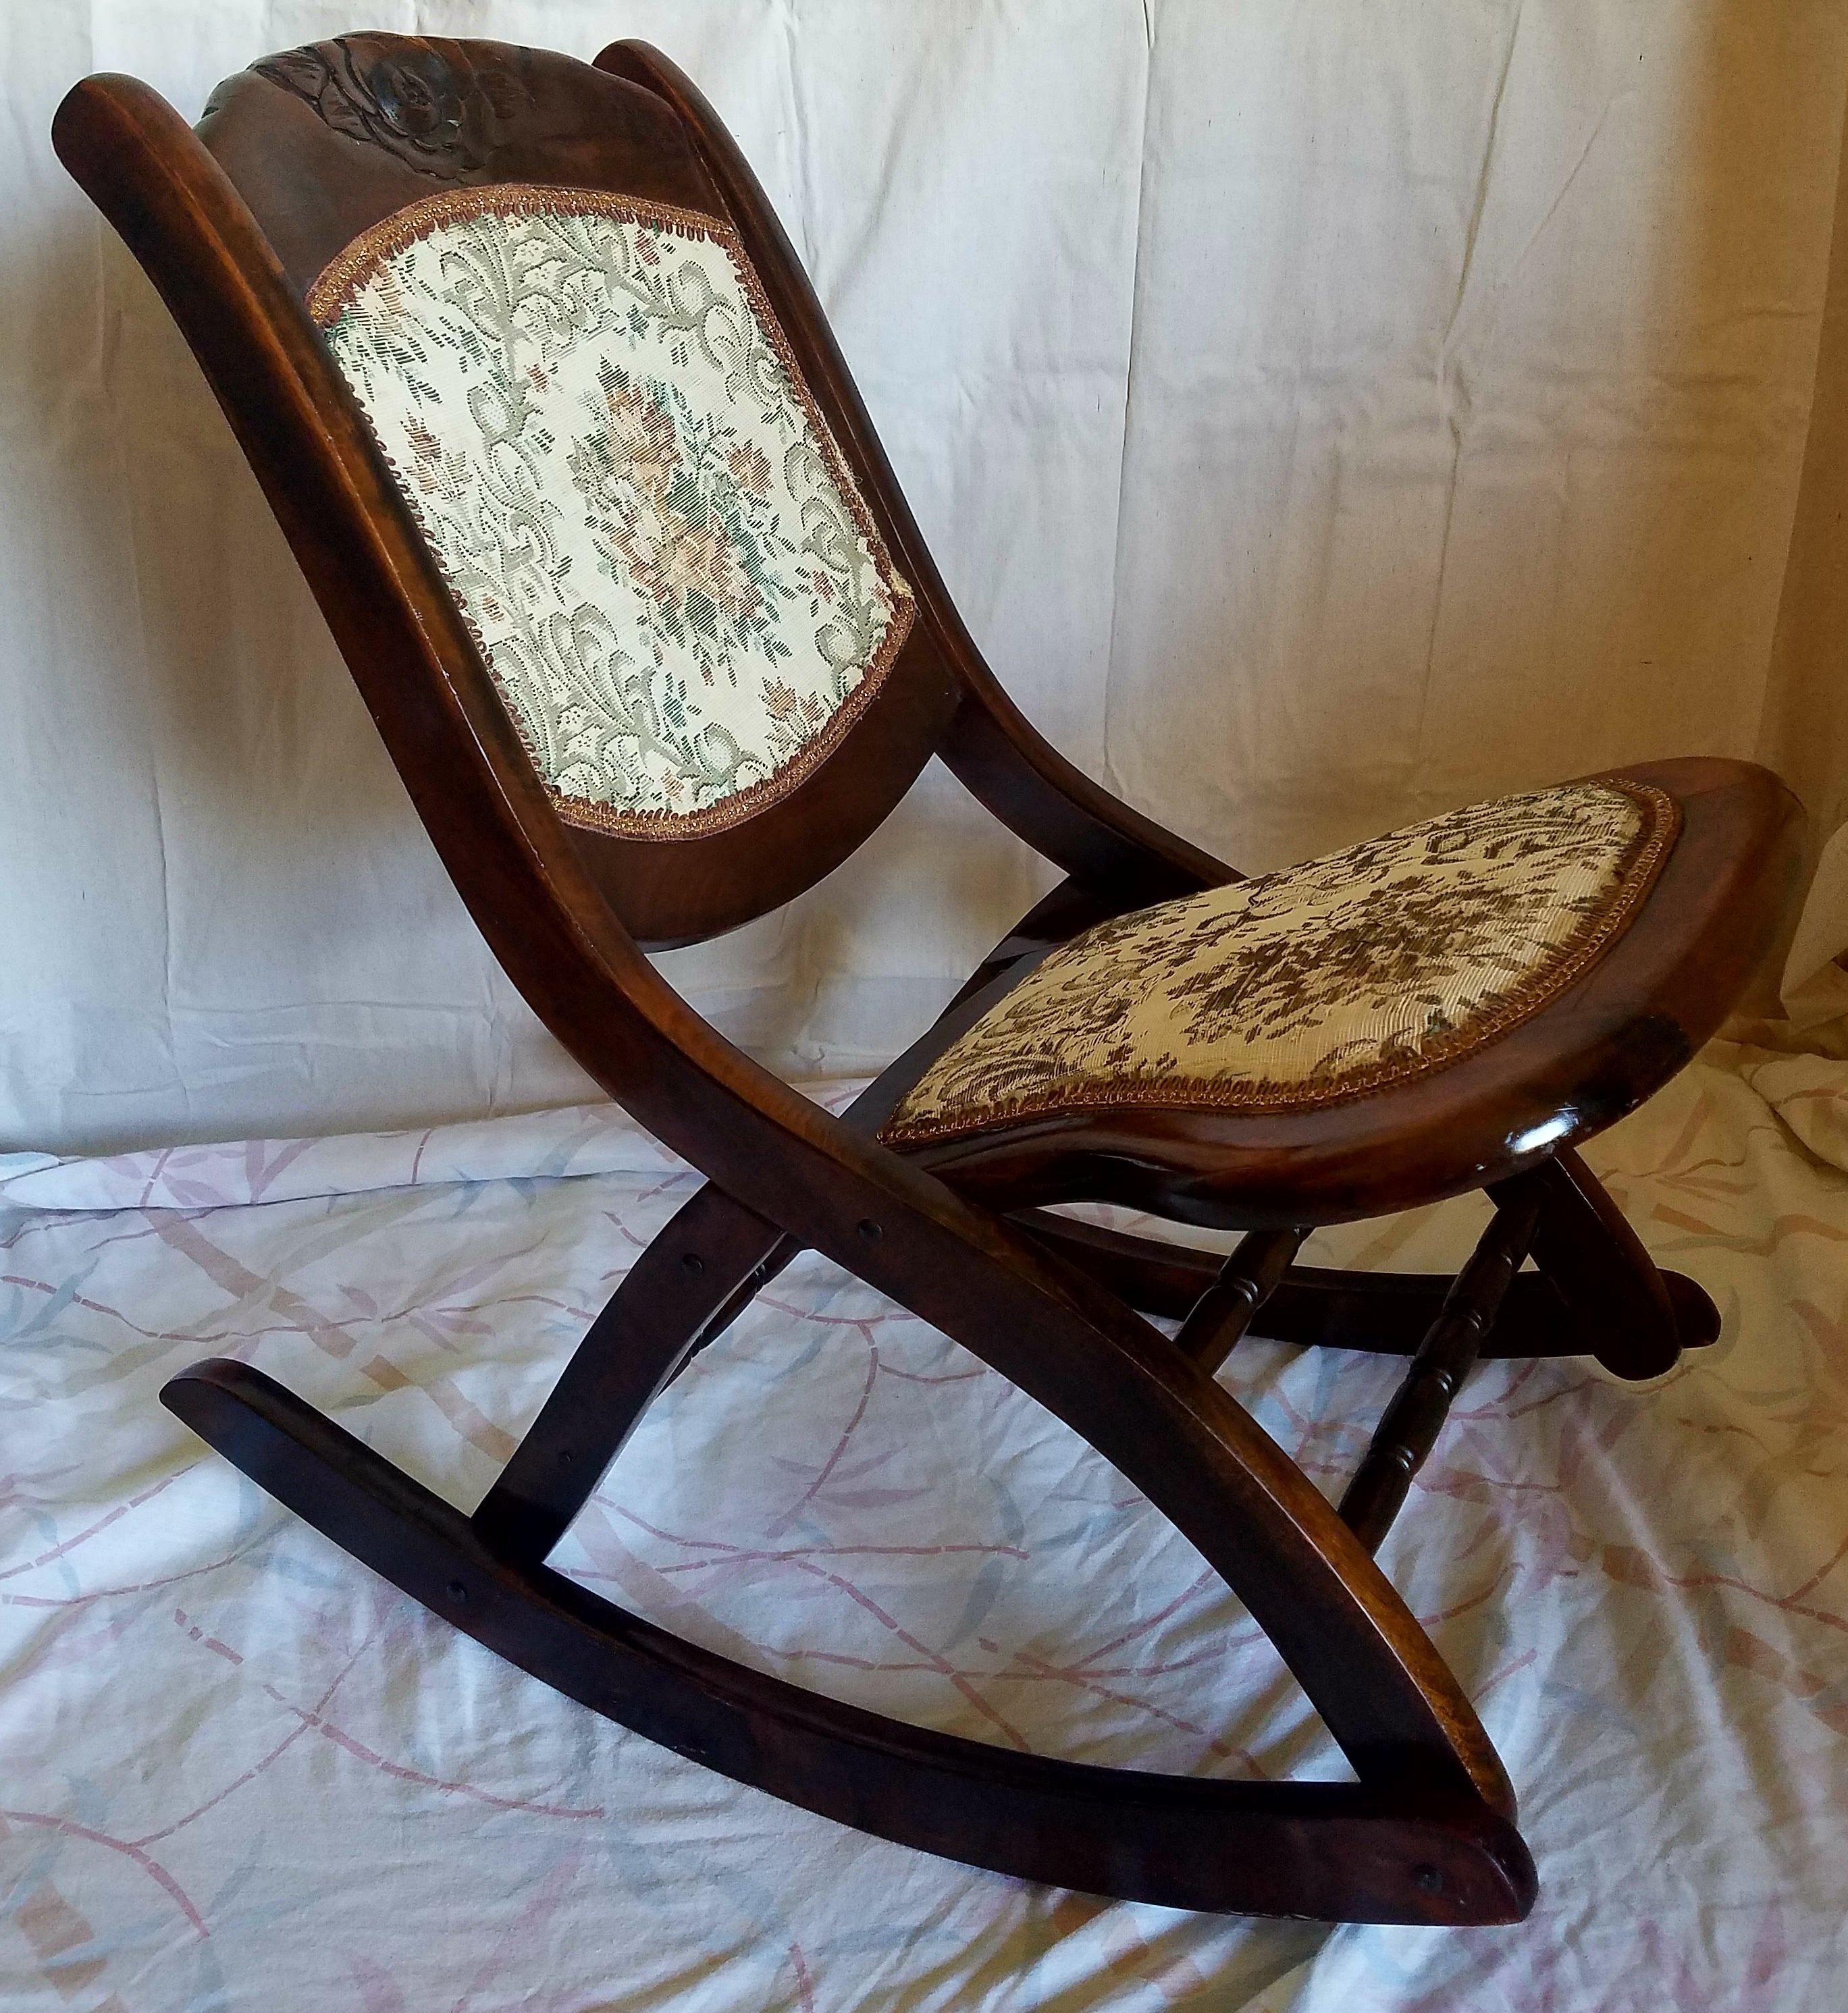 antique folding rocking chair Antique Folding Rocking Chair   Chairish antique folding rocking chair